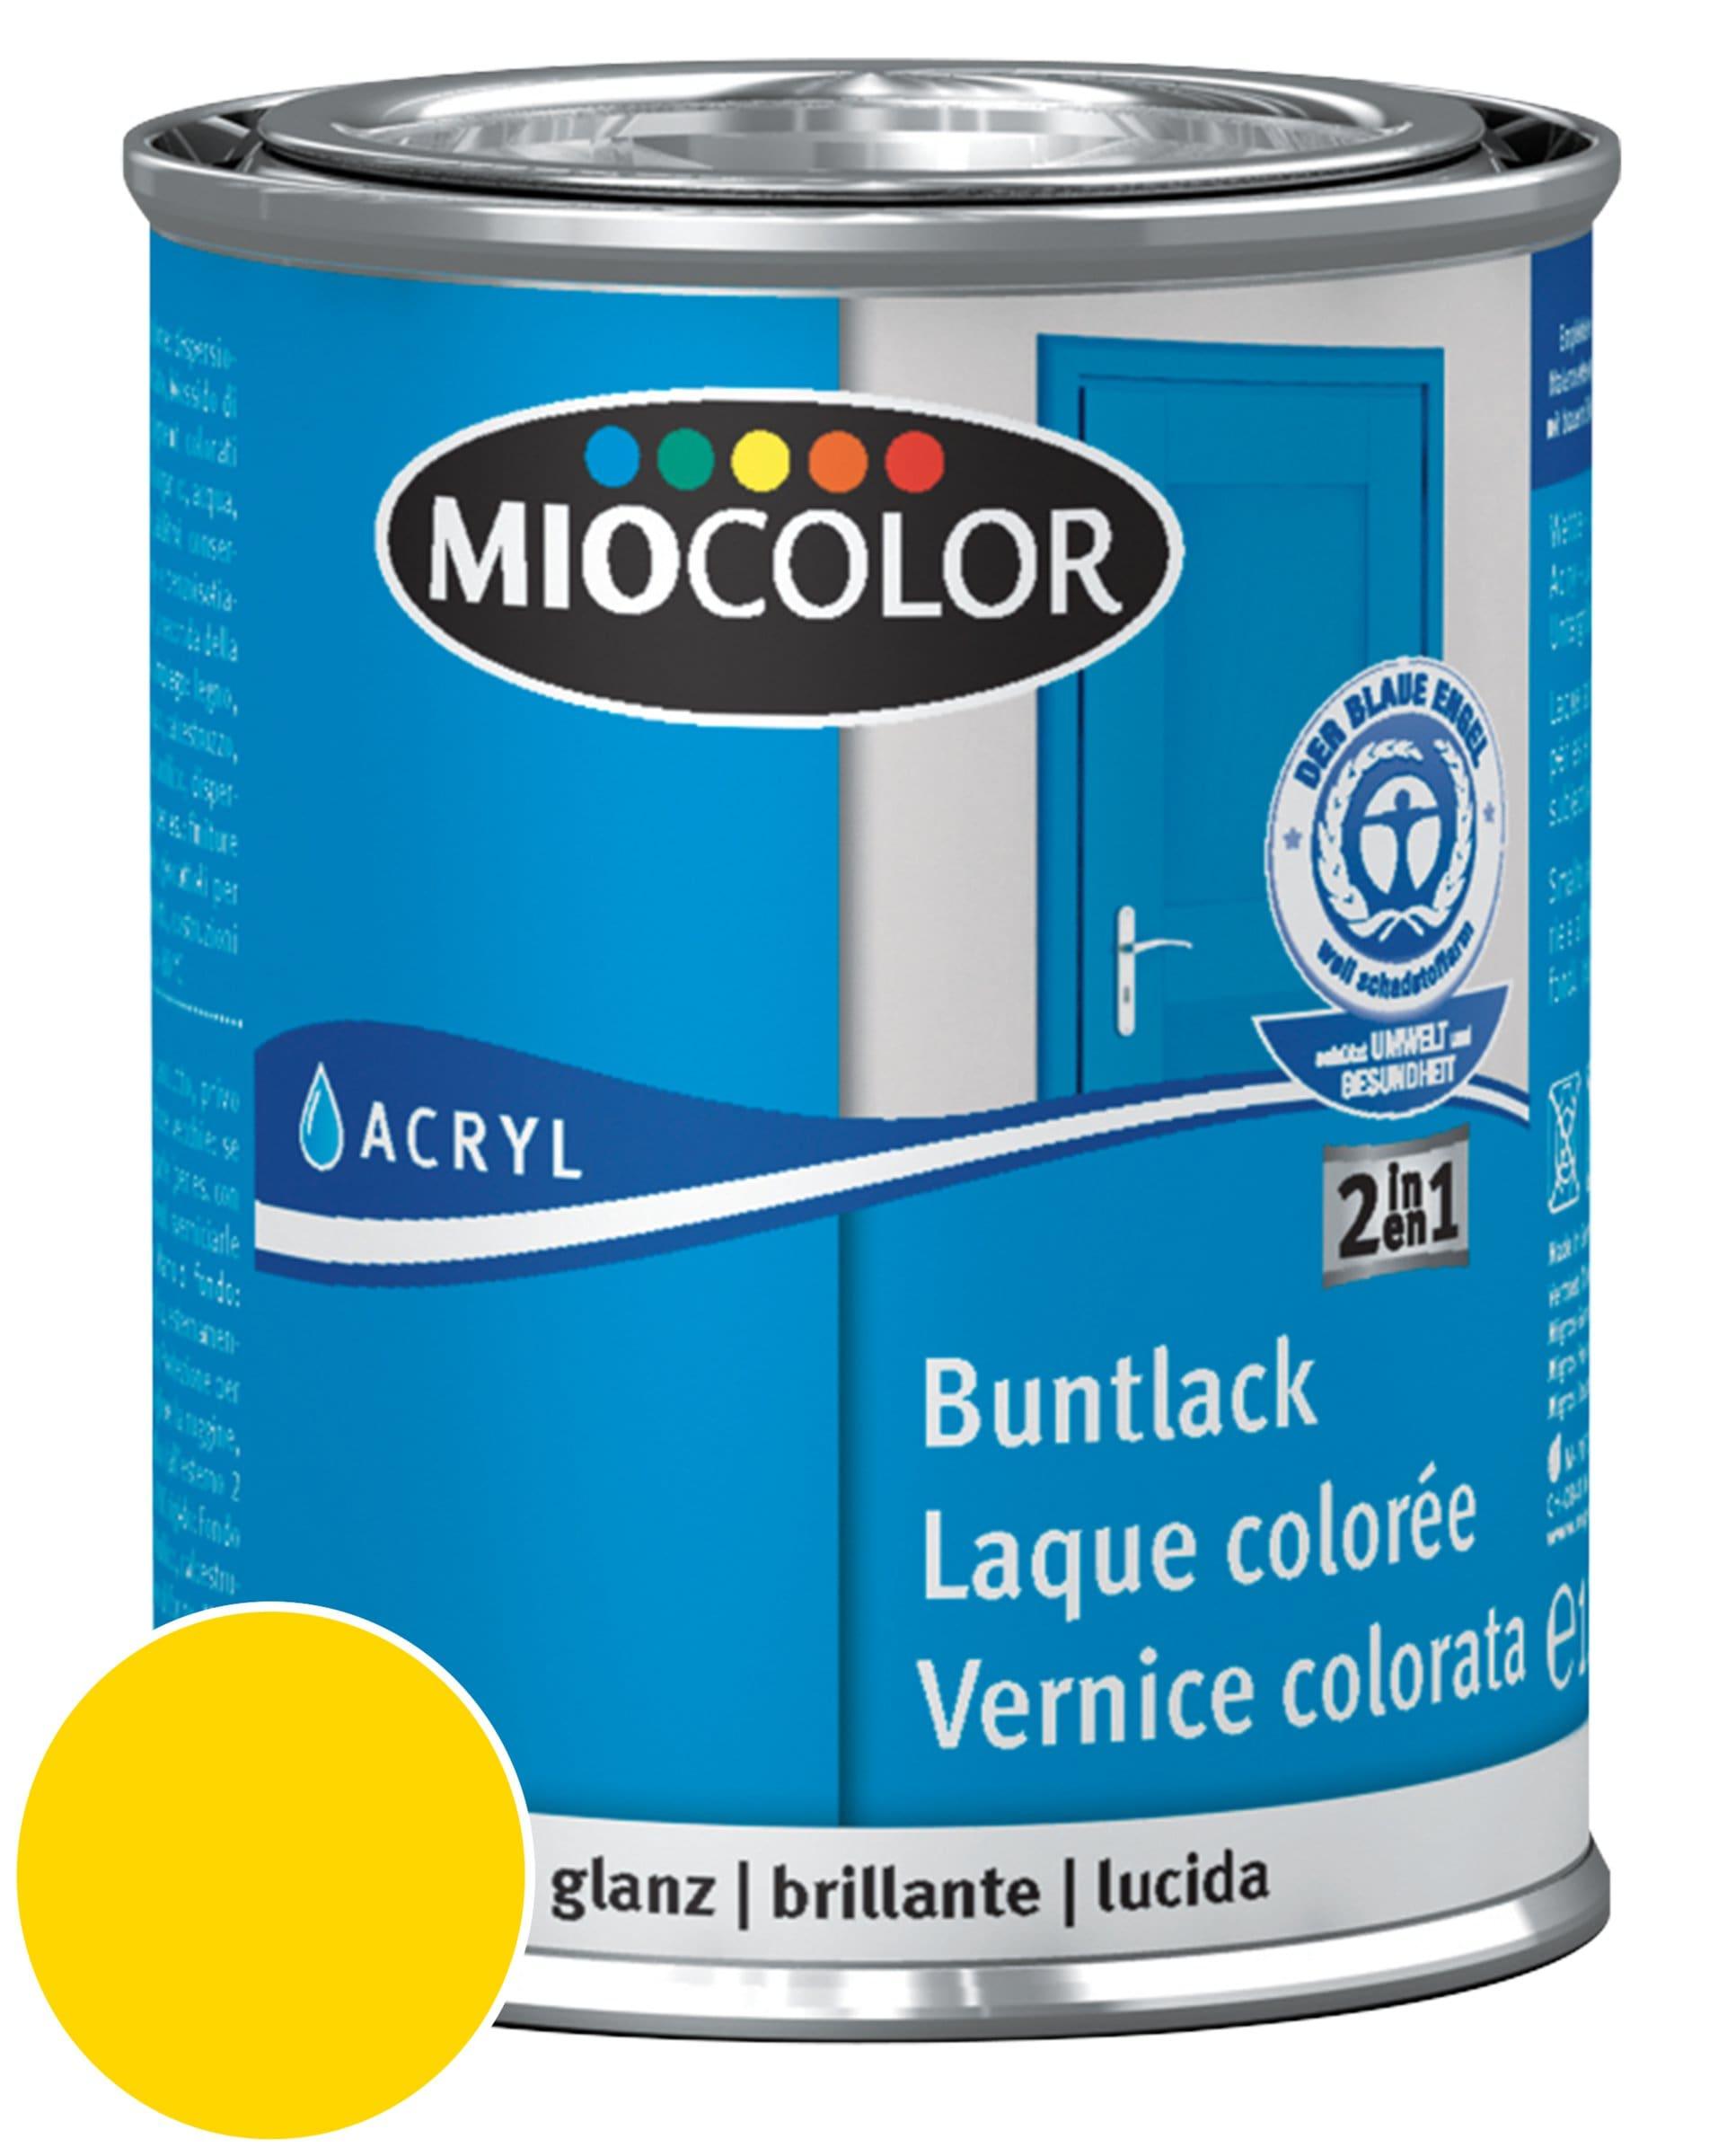 Miocolor Acryl Vernice colorata lucida Giallo navone 375 ml